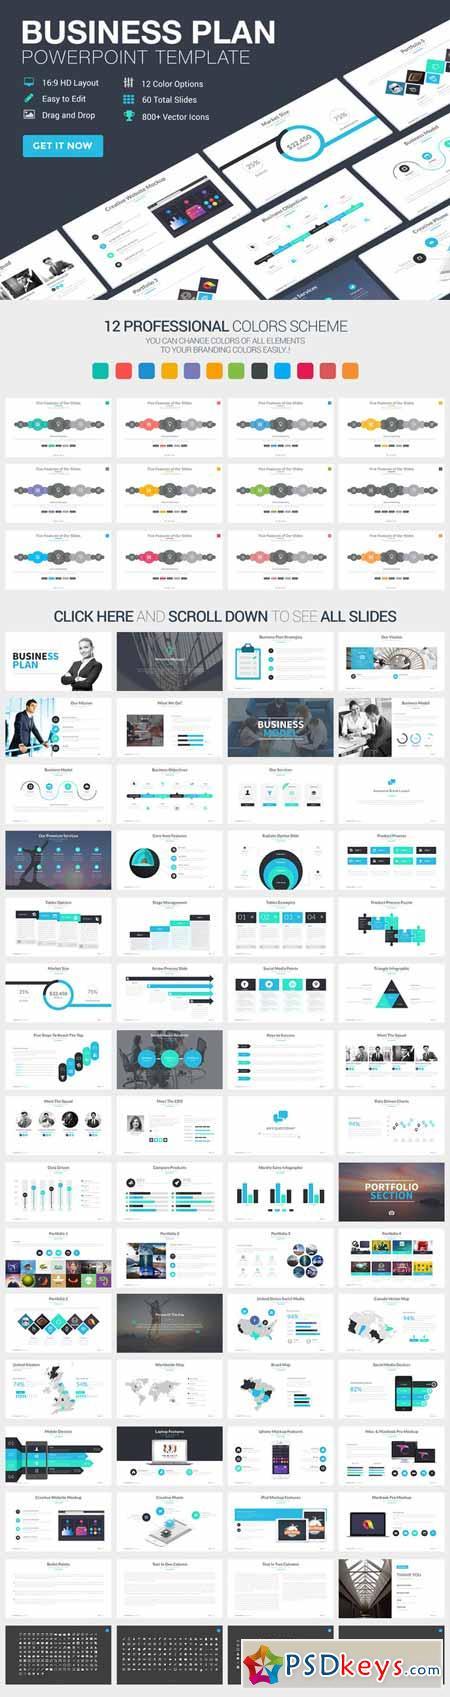 Business Plan Powerpoint Template 375476